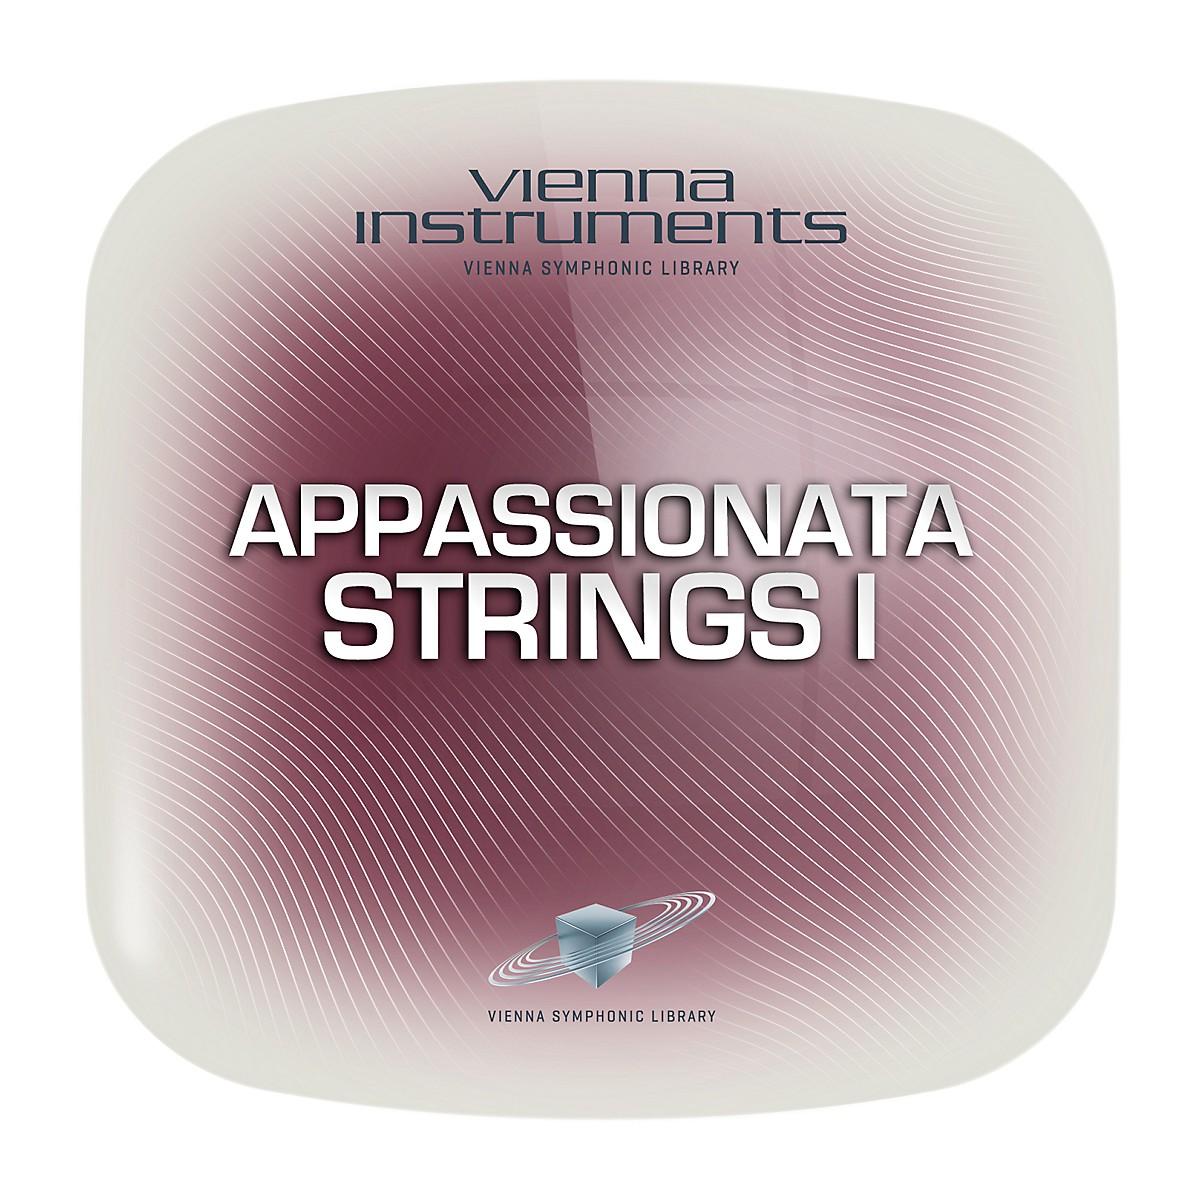 Vienna Instruments Appassionata Strings I Standard Software Download